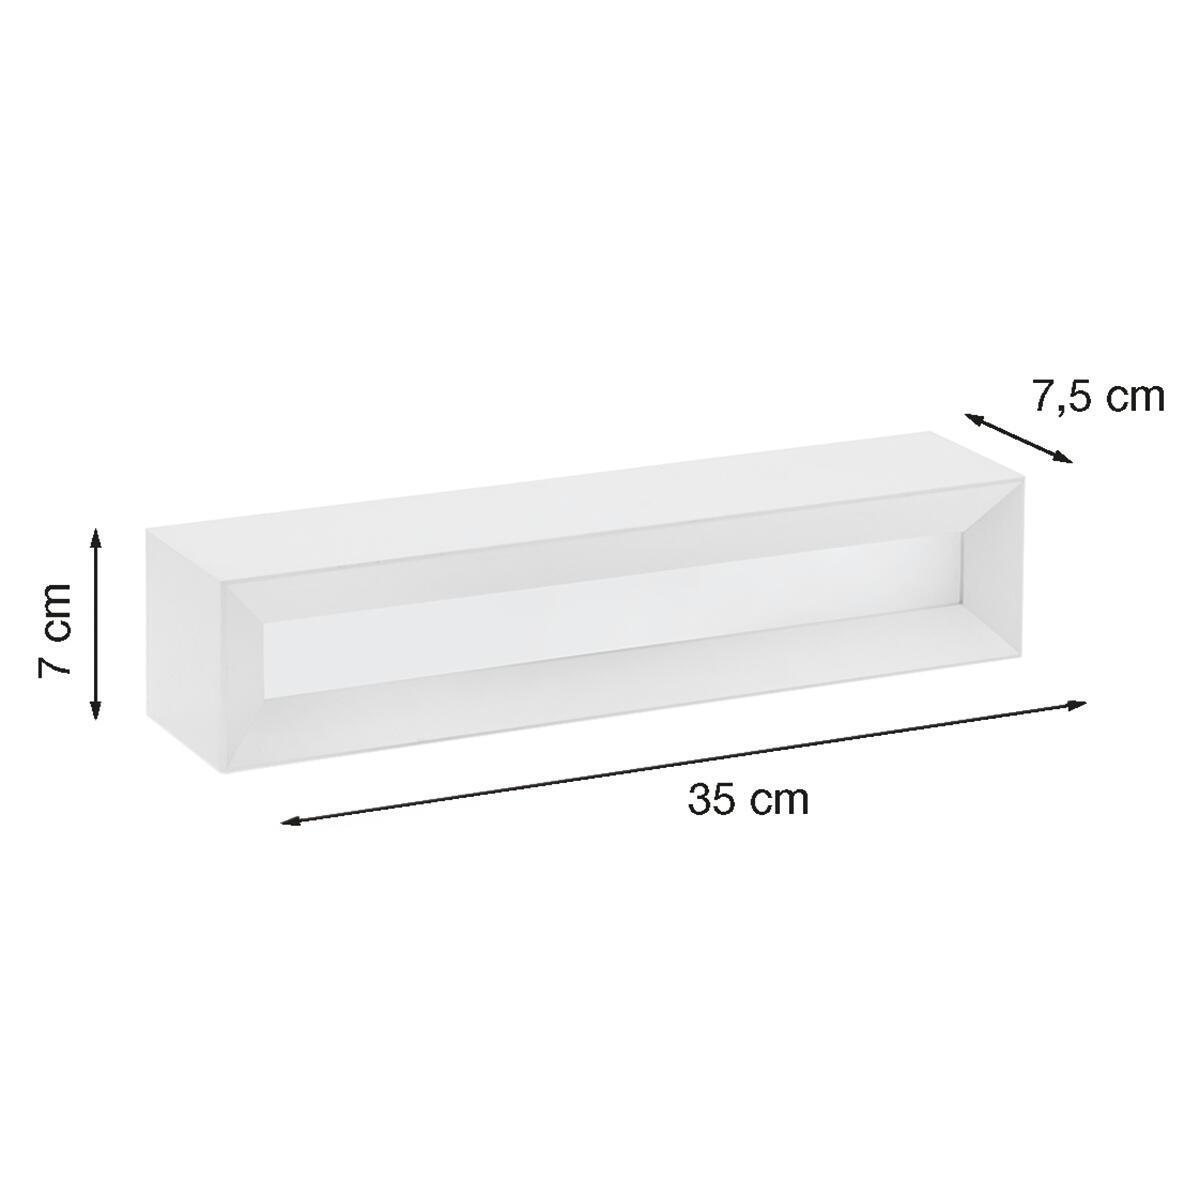 Applique design Hermione bianco, in gesso, 7x35 cm, 2 luci TECNICO - 5